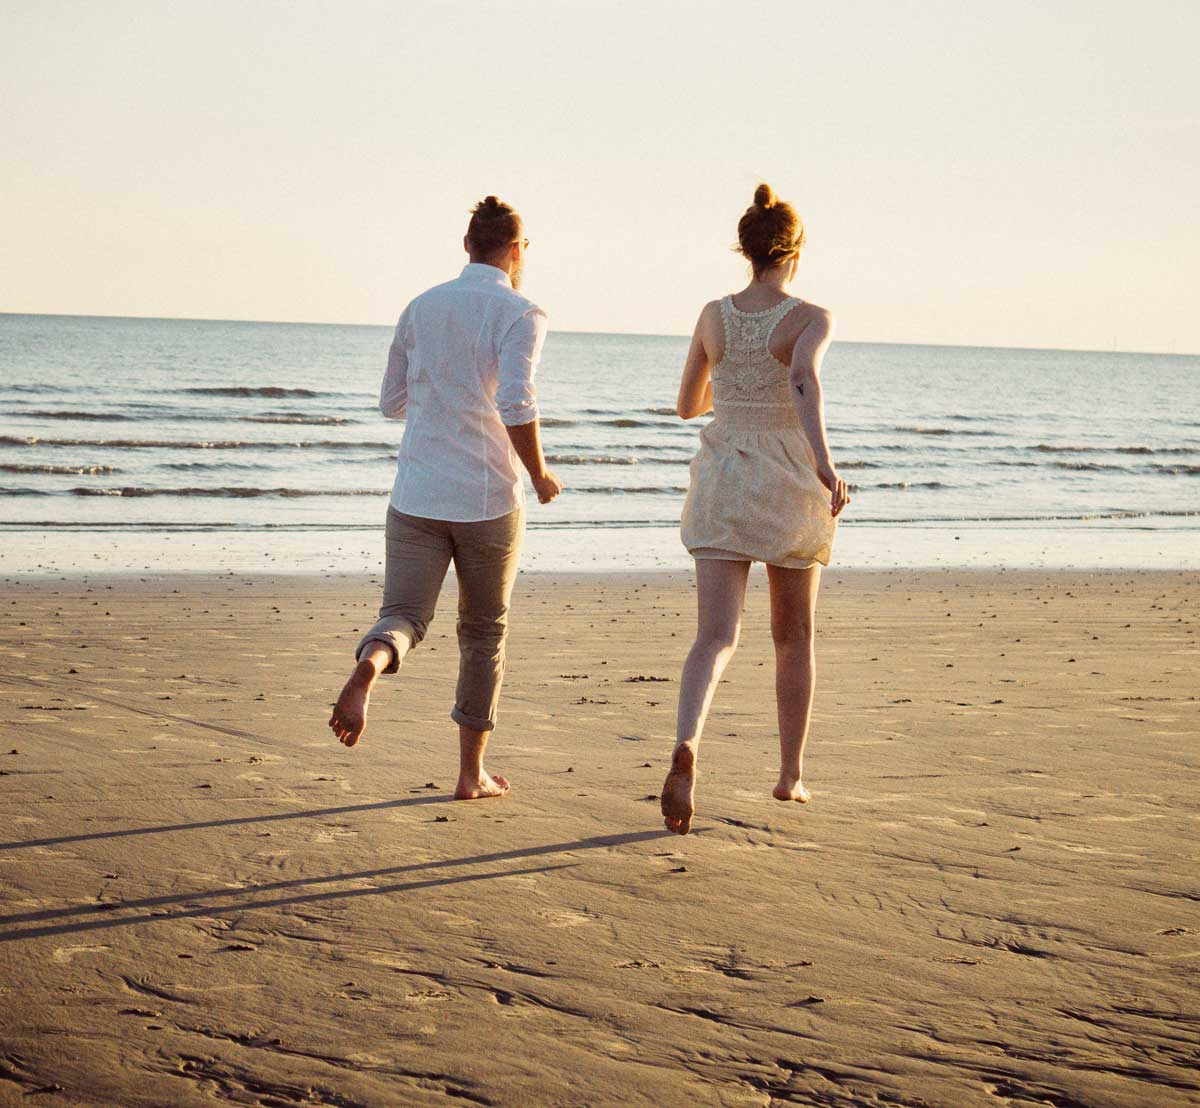 ©️benjamin wojcik photography - Fotograf Dortmund: Mann und Frau laufen am Strand